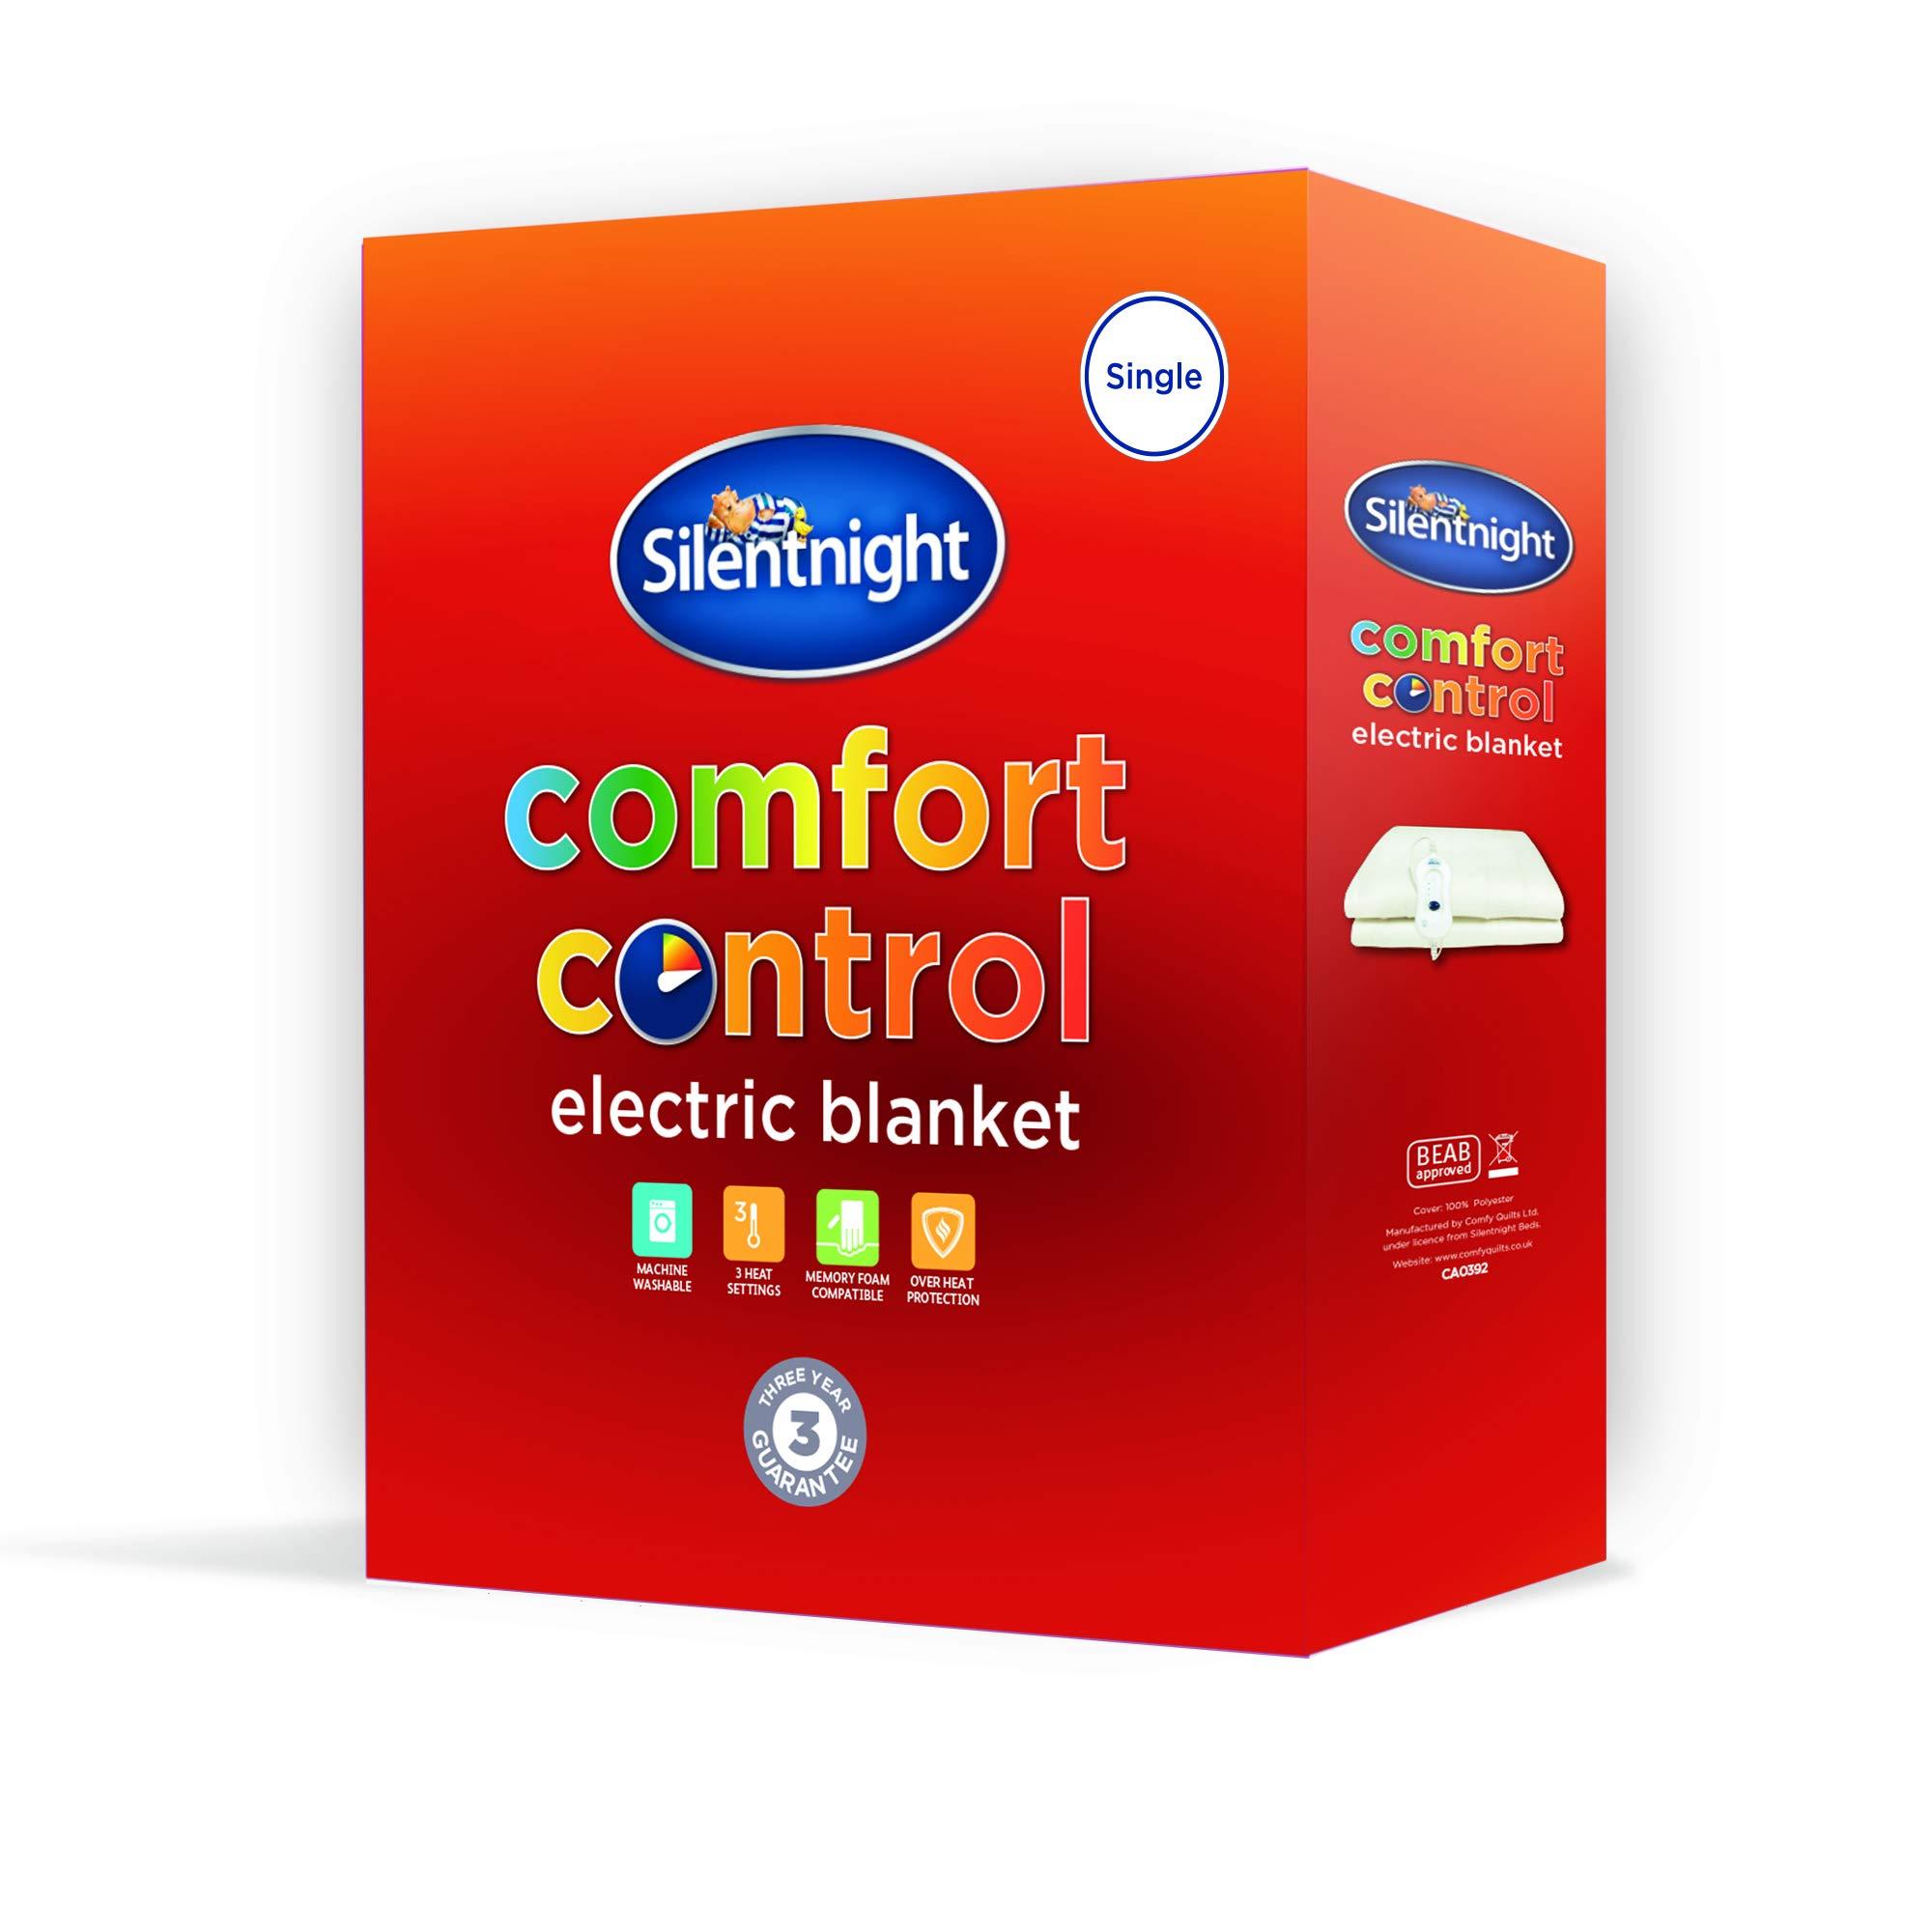 Silentnight Comfort Control Electric Bla Buy Online In Canada At Desertcart